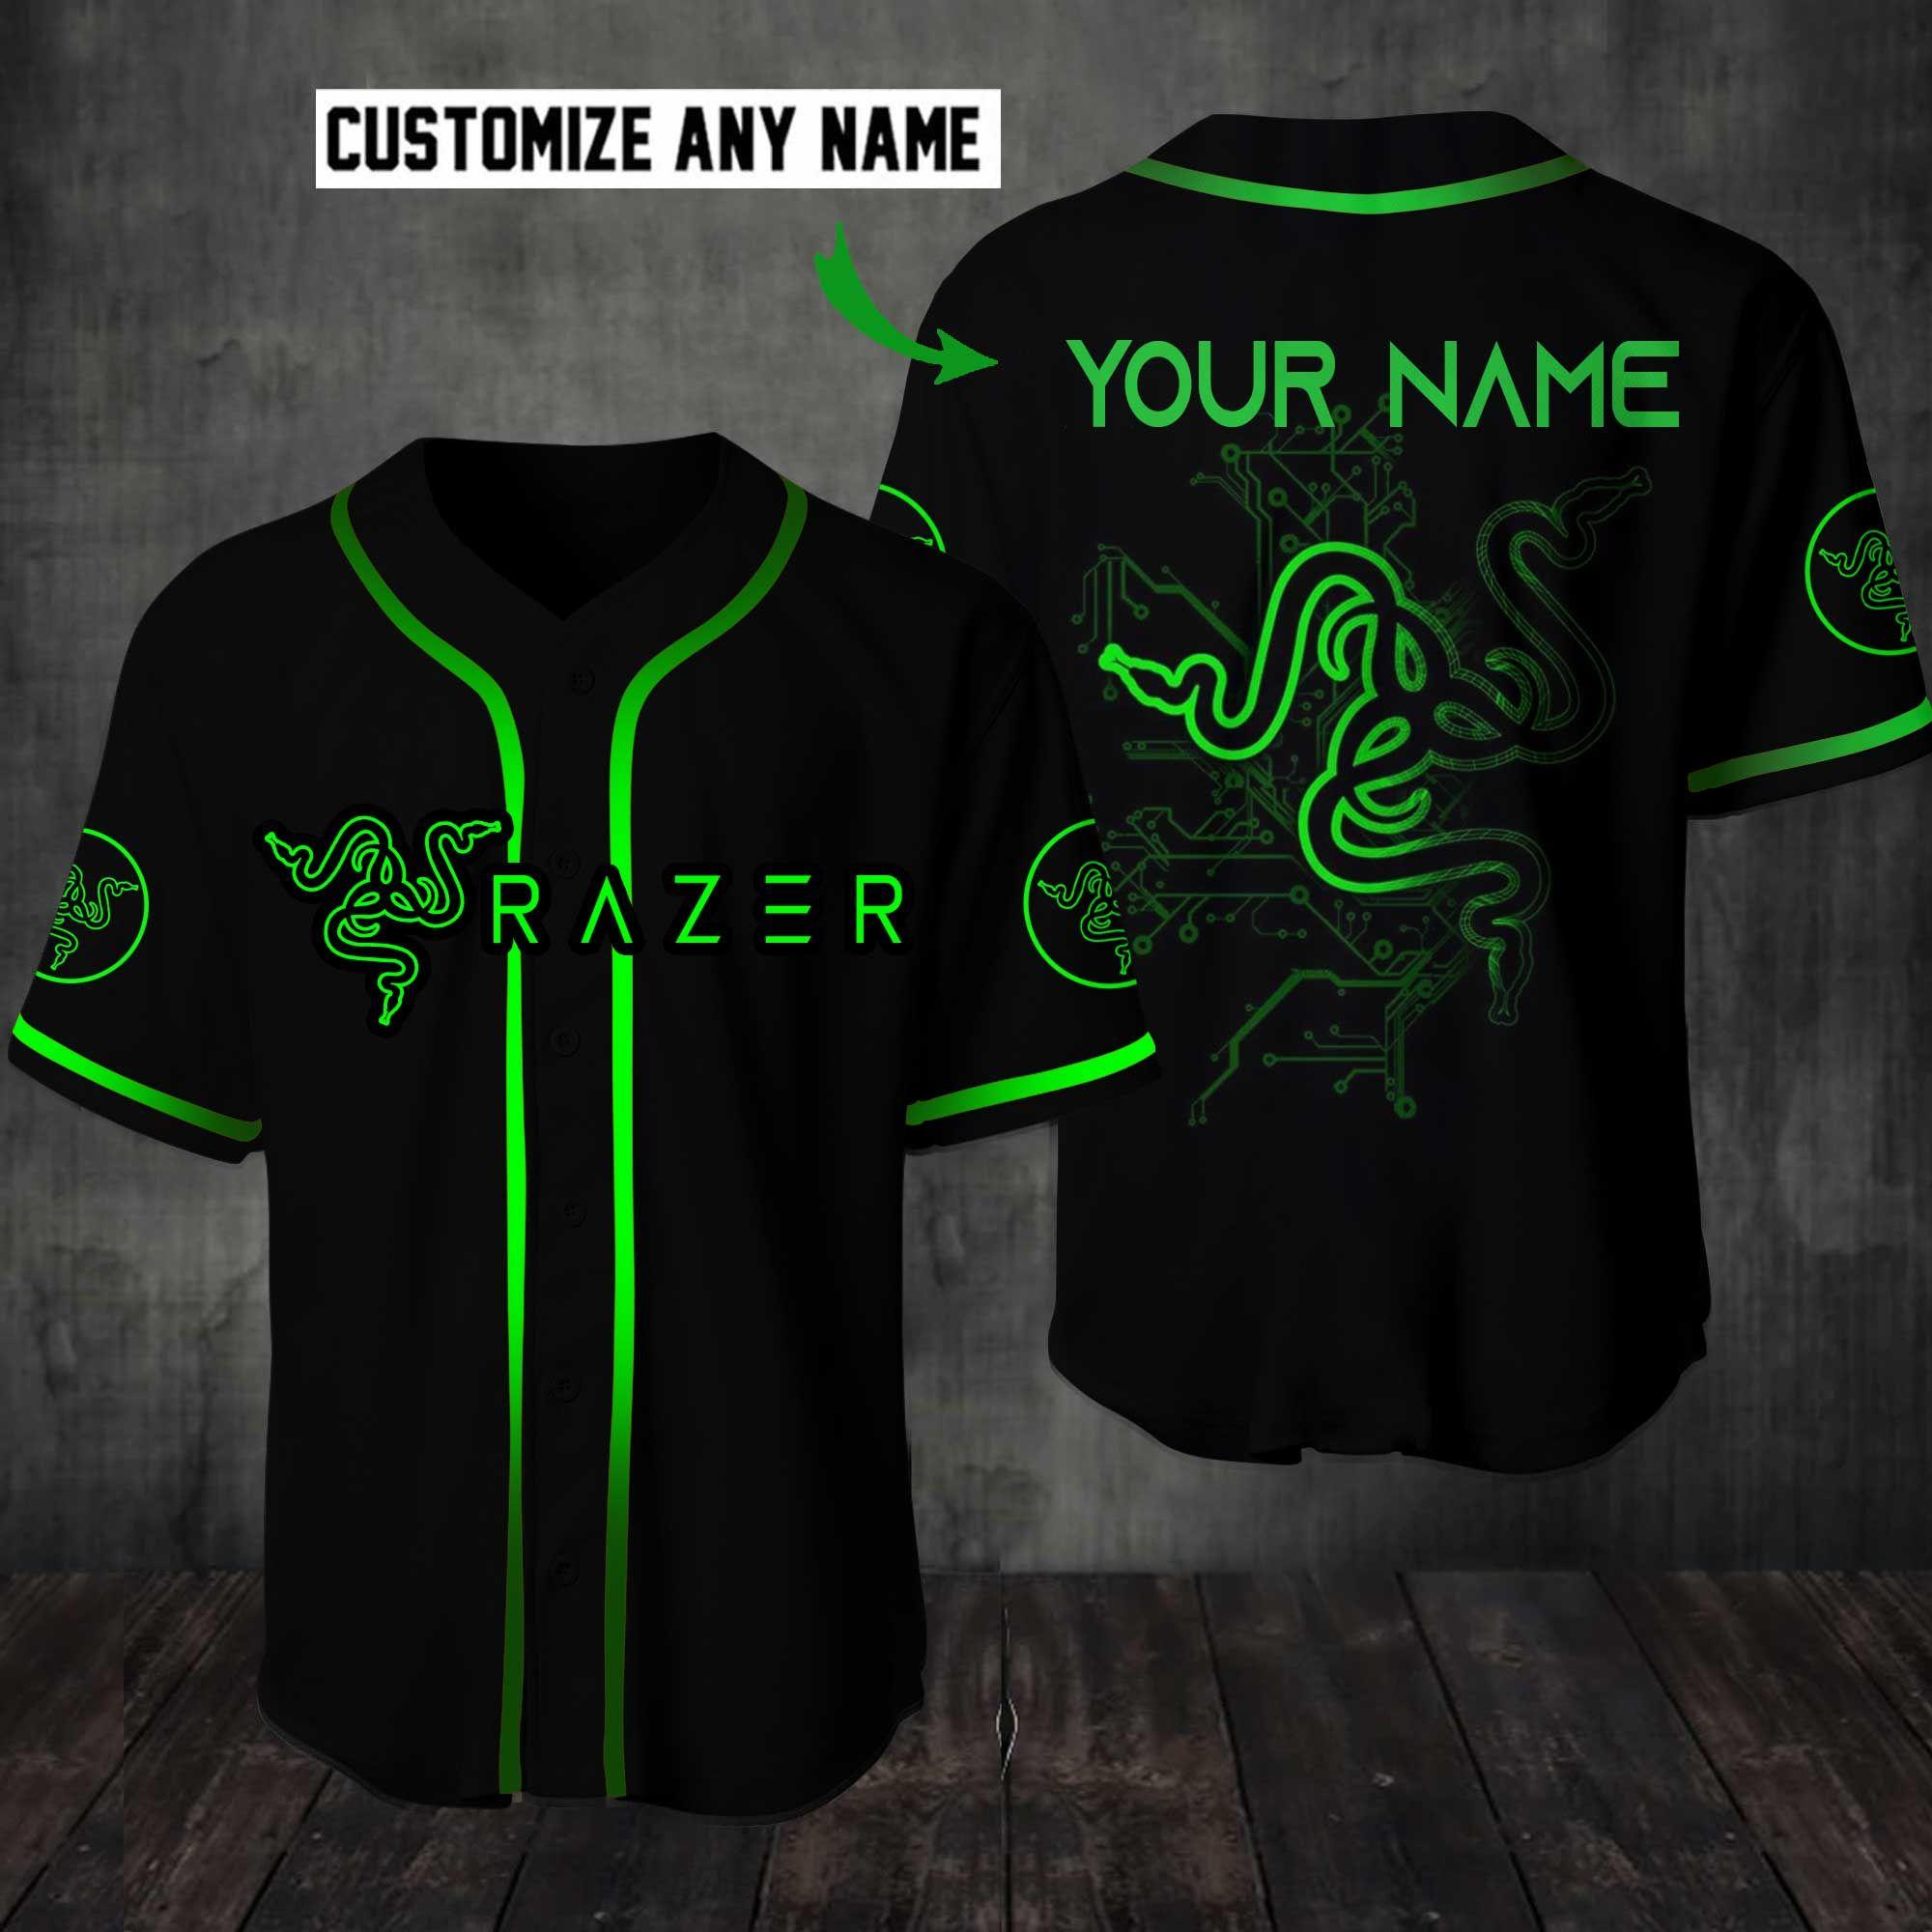 Razer Customize Name Baseball Jersey Shirt